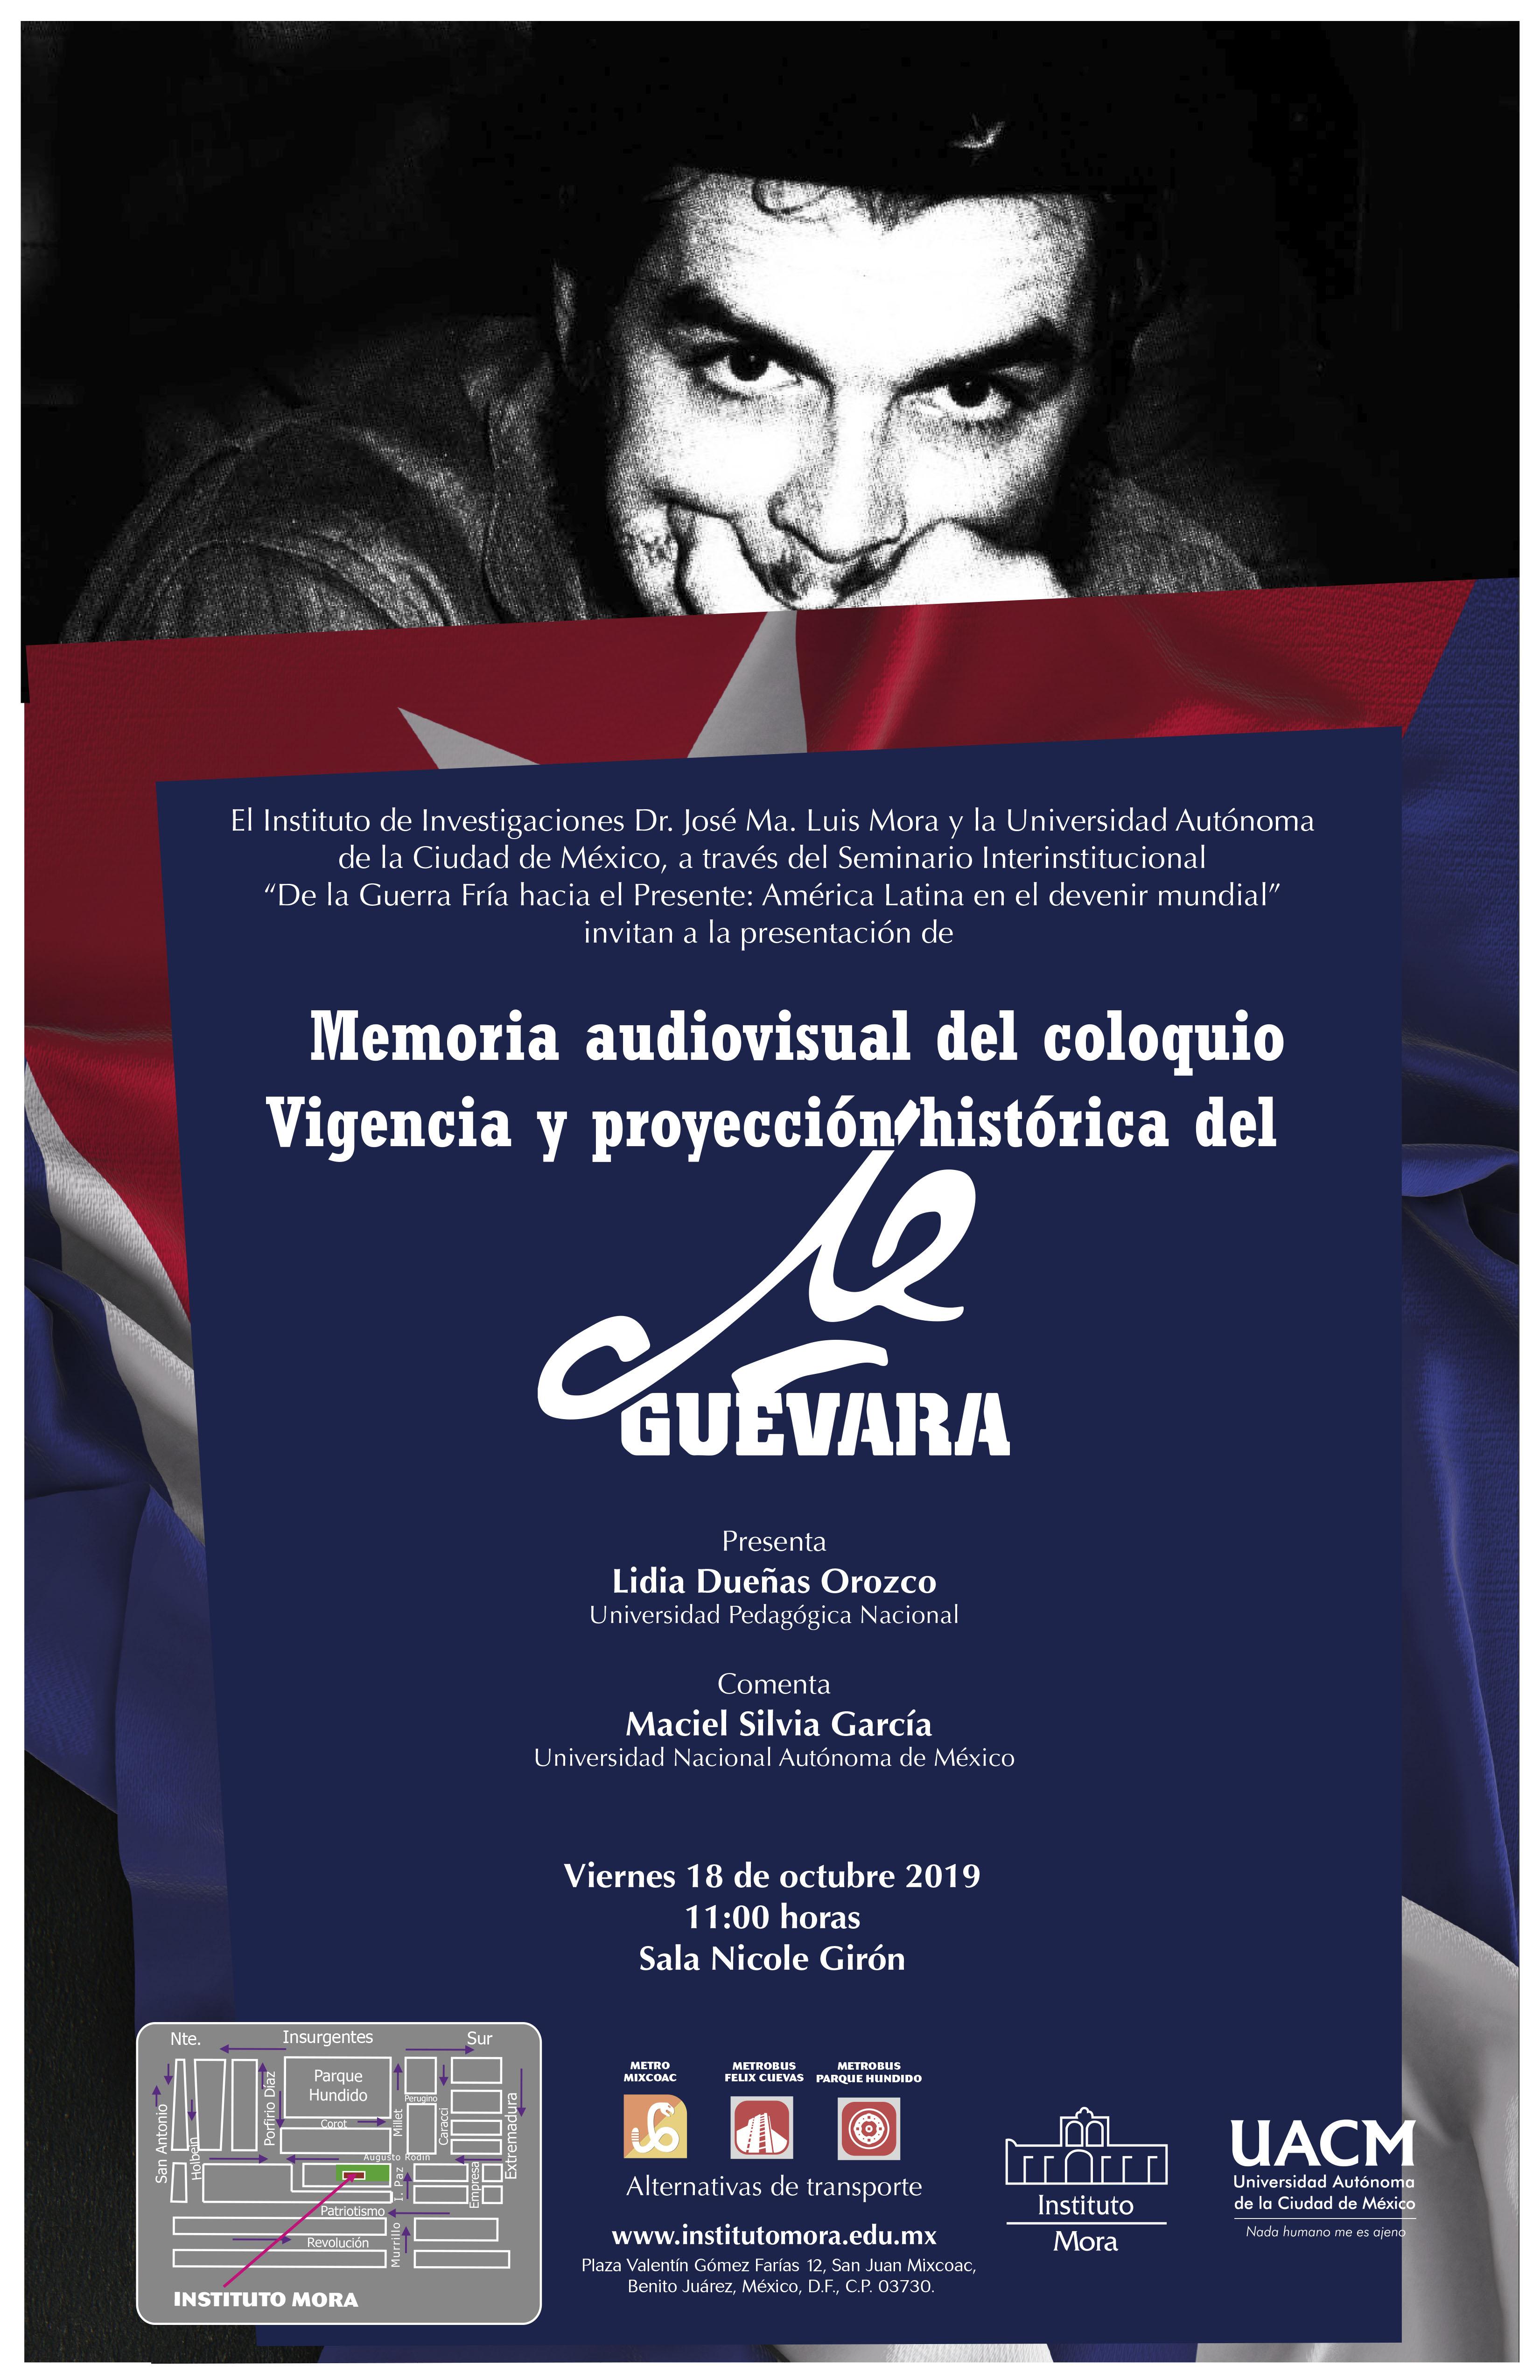 https://www.institutomora.edu.mx/Instituto/IE/1017_IECnf00-1019.jpg.jpg